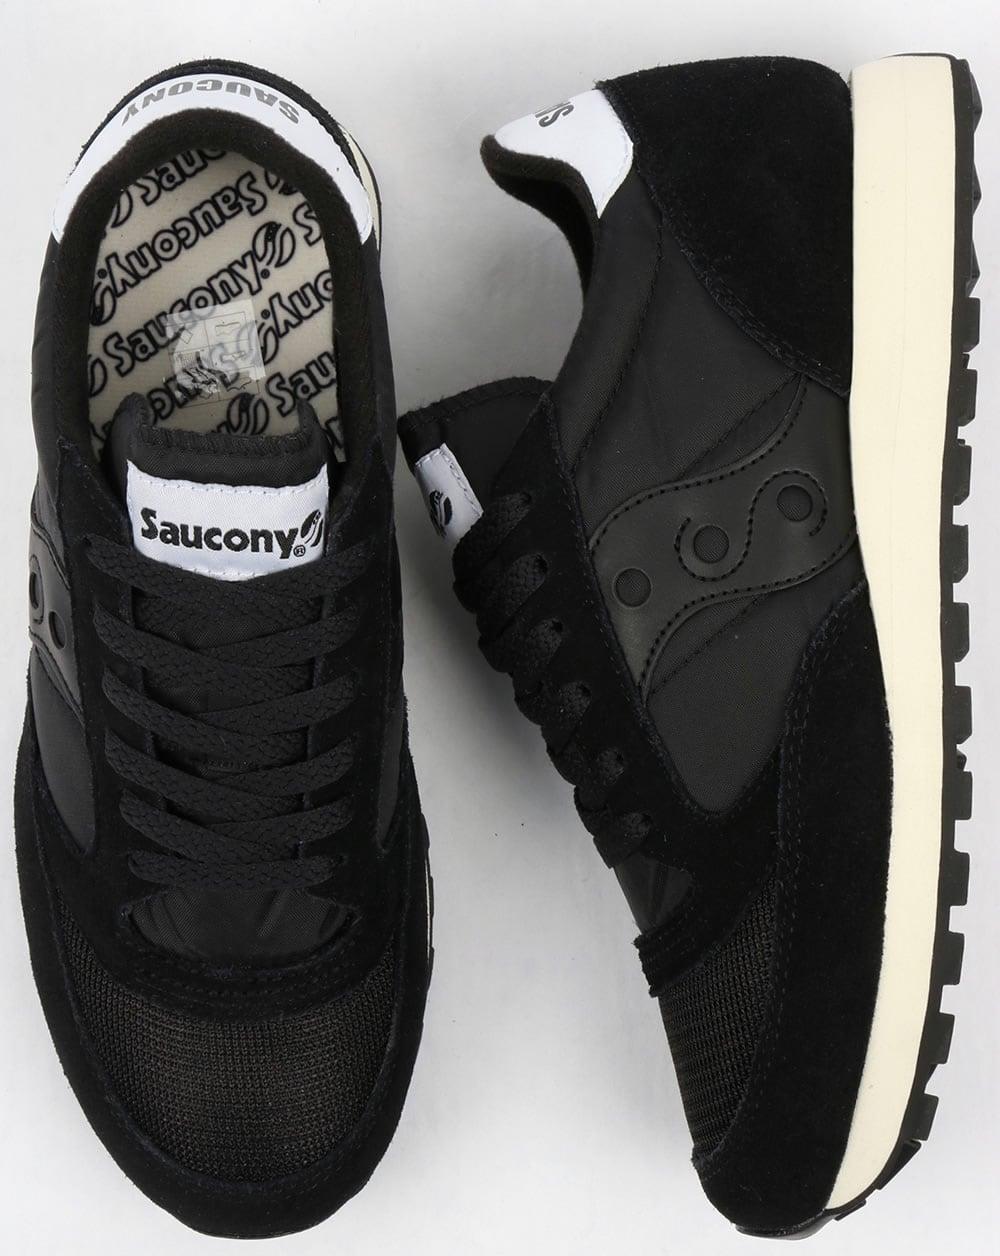 saucony black trainers